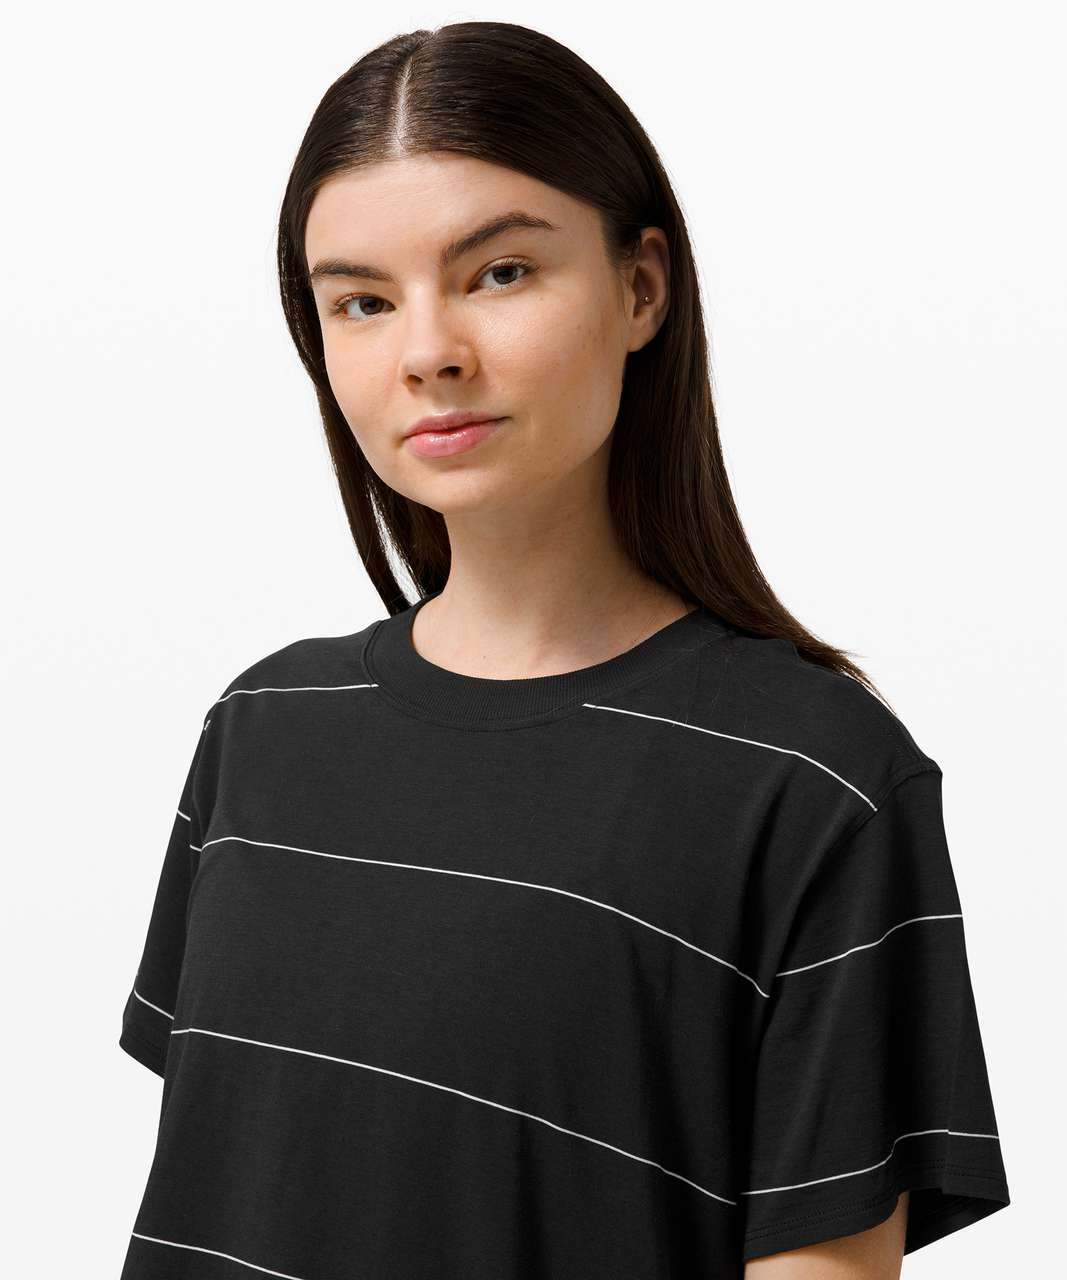 Lululemon All Yours Tee - Sup Stripe Black White